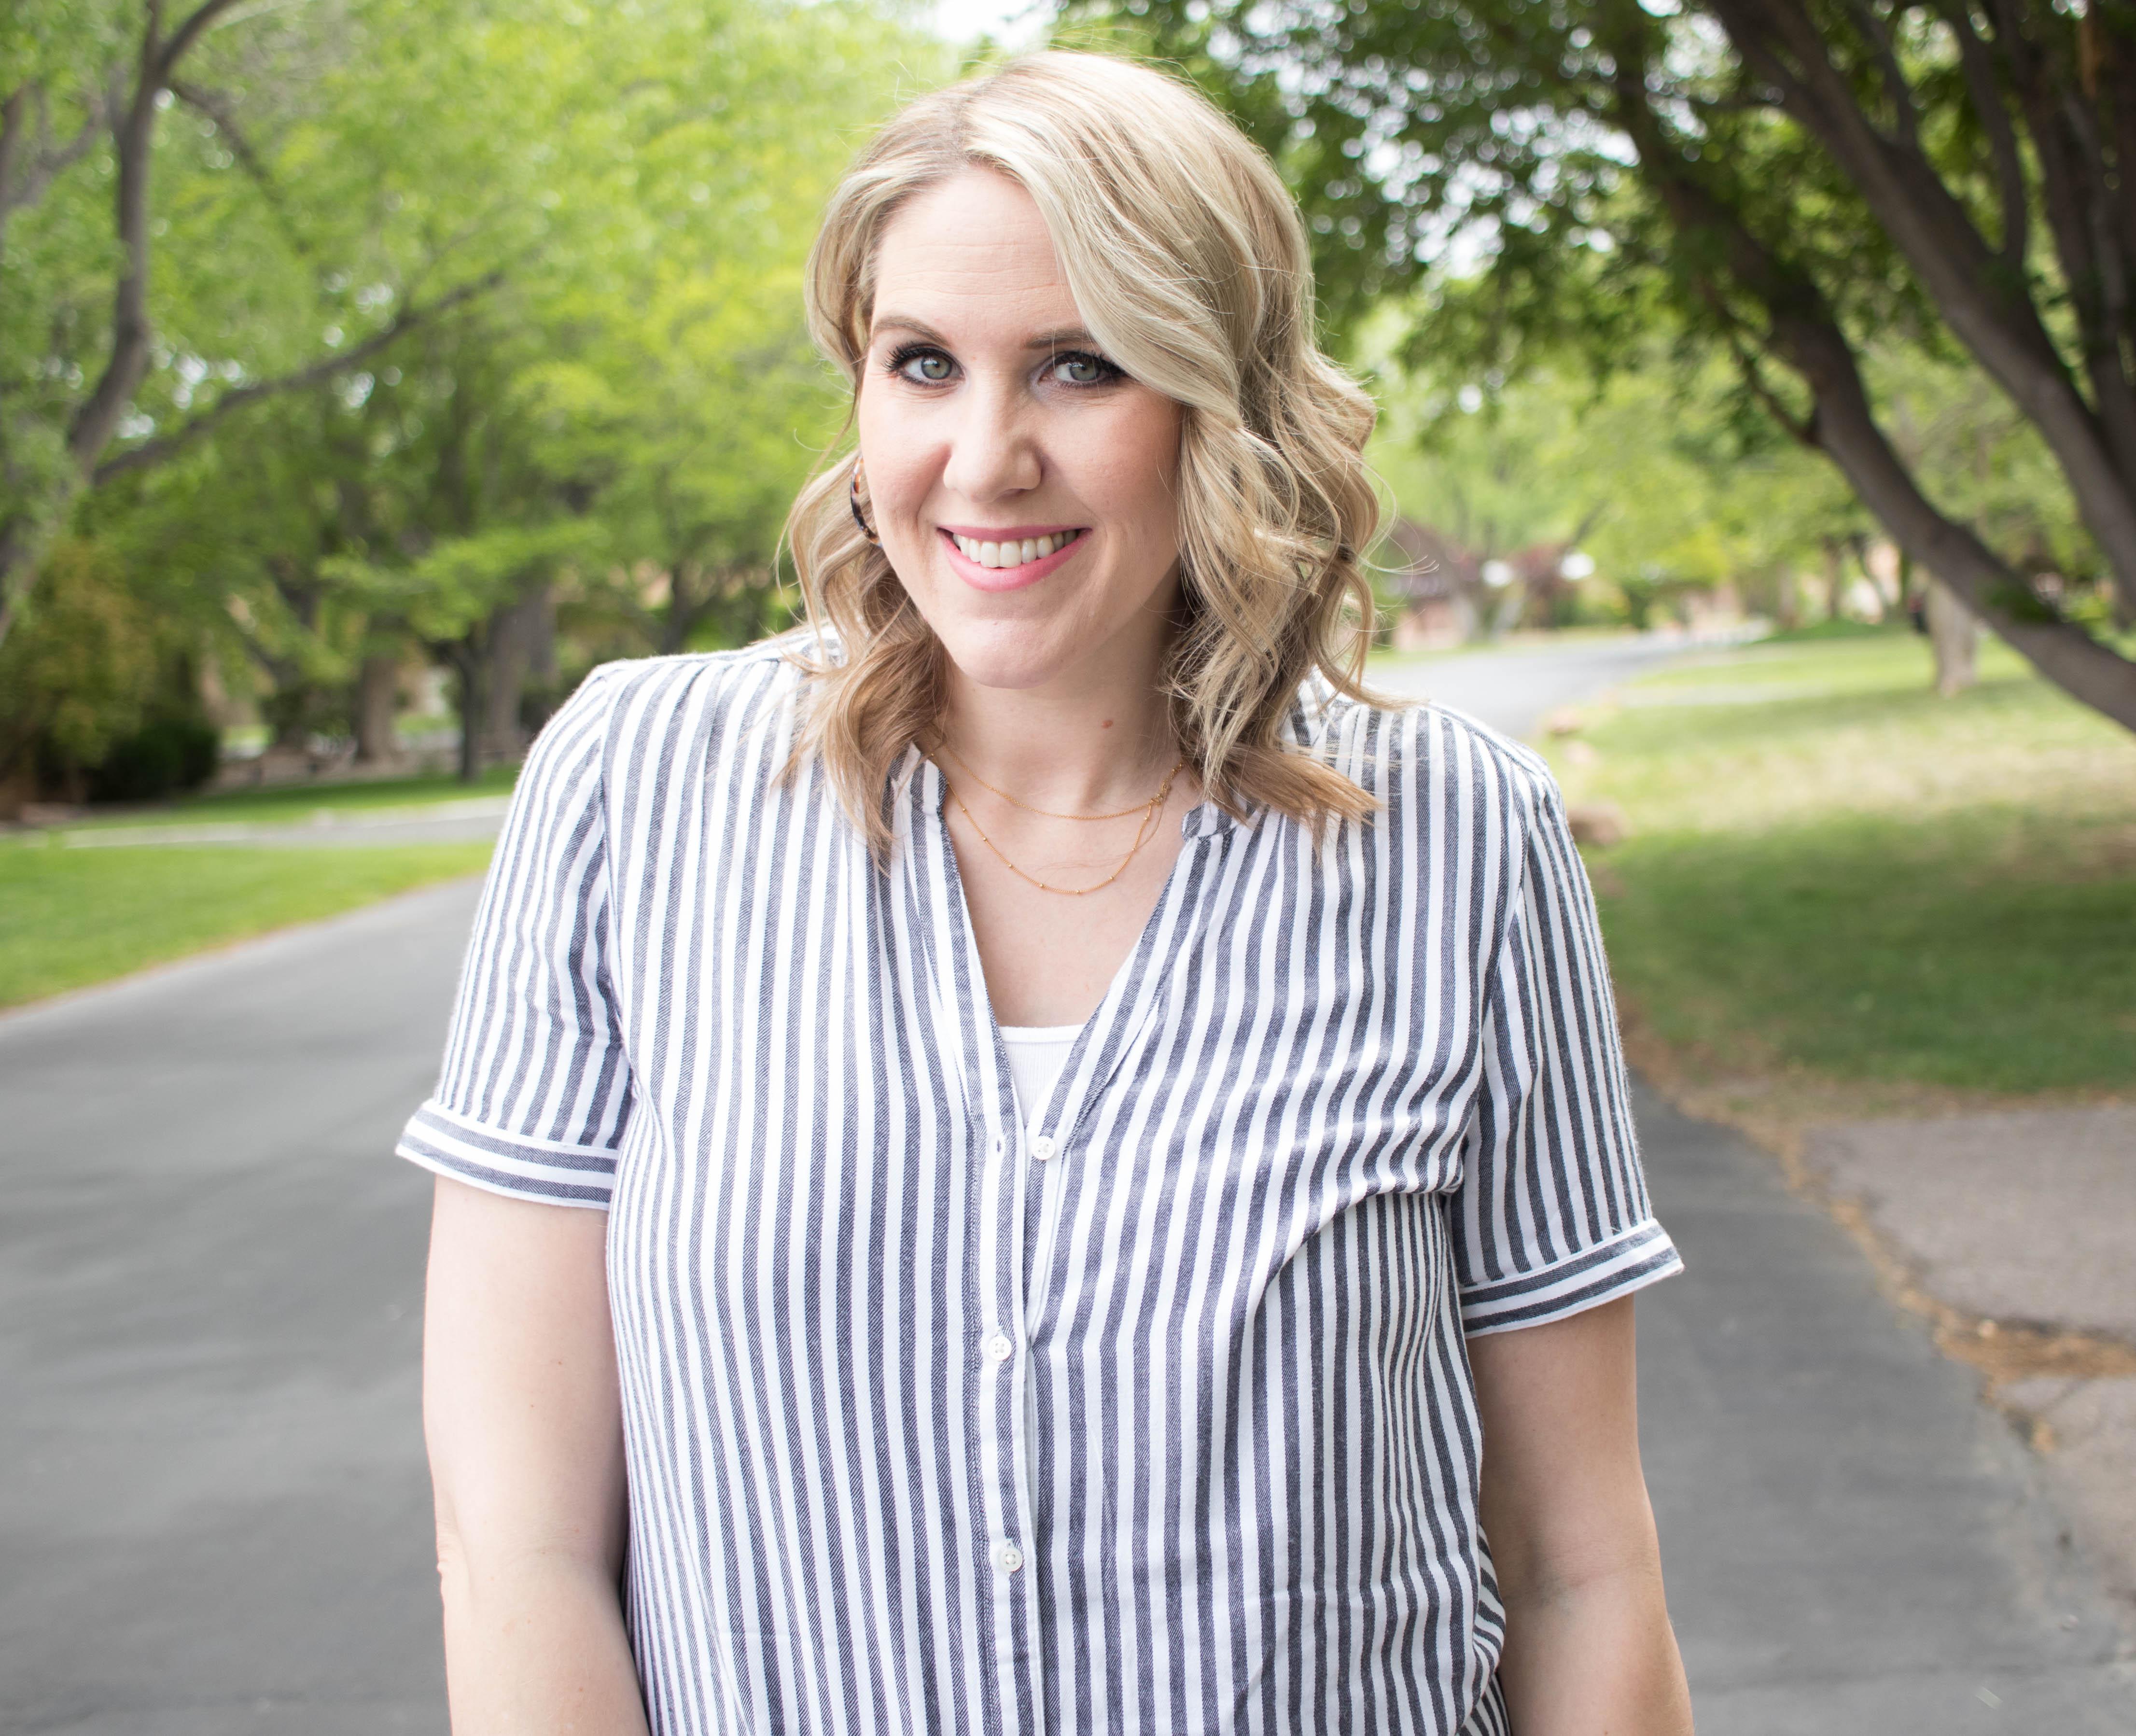 gap maternity striped blouse #bumpstyle #maternitystyle #gap